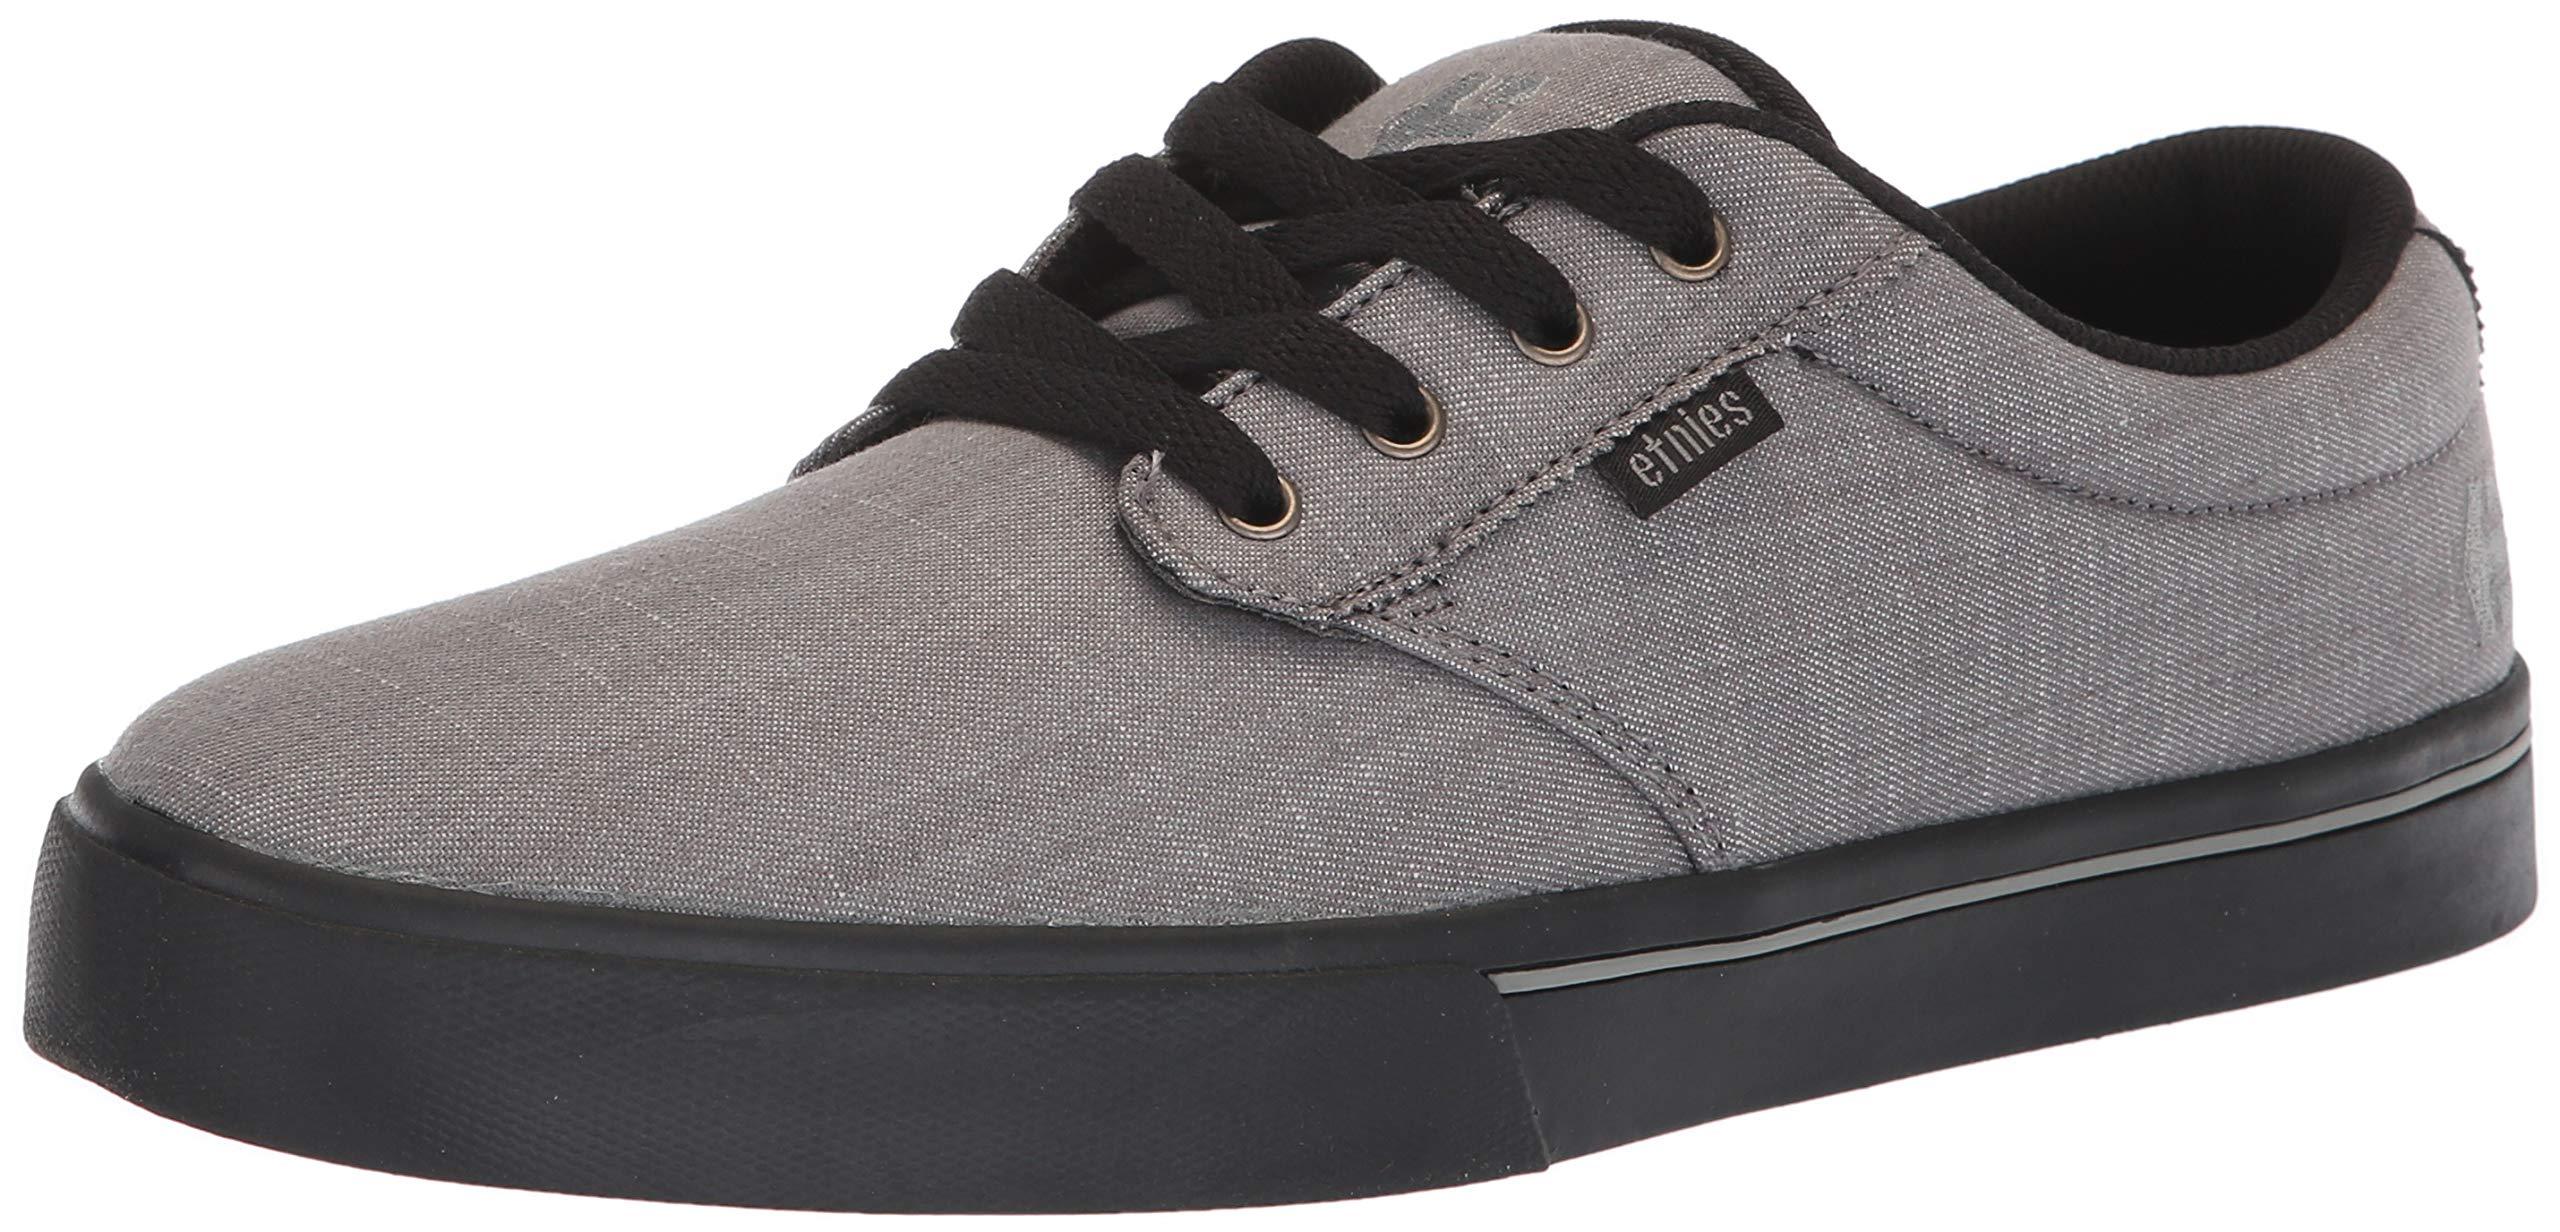 De Selon Skateboard Top Chaussures Les Notes f6YvIbgy7m